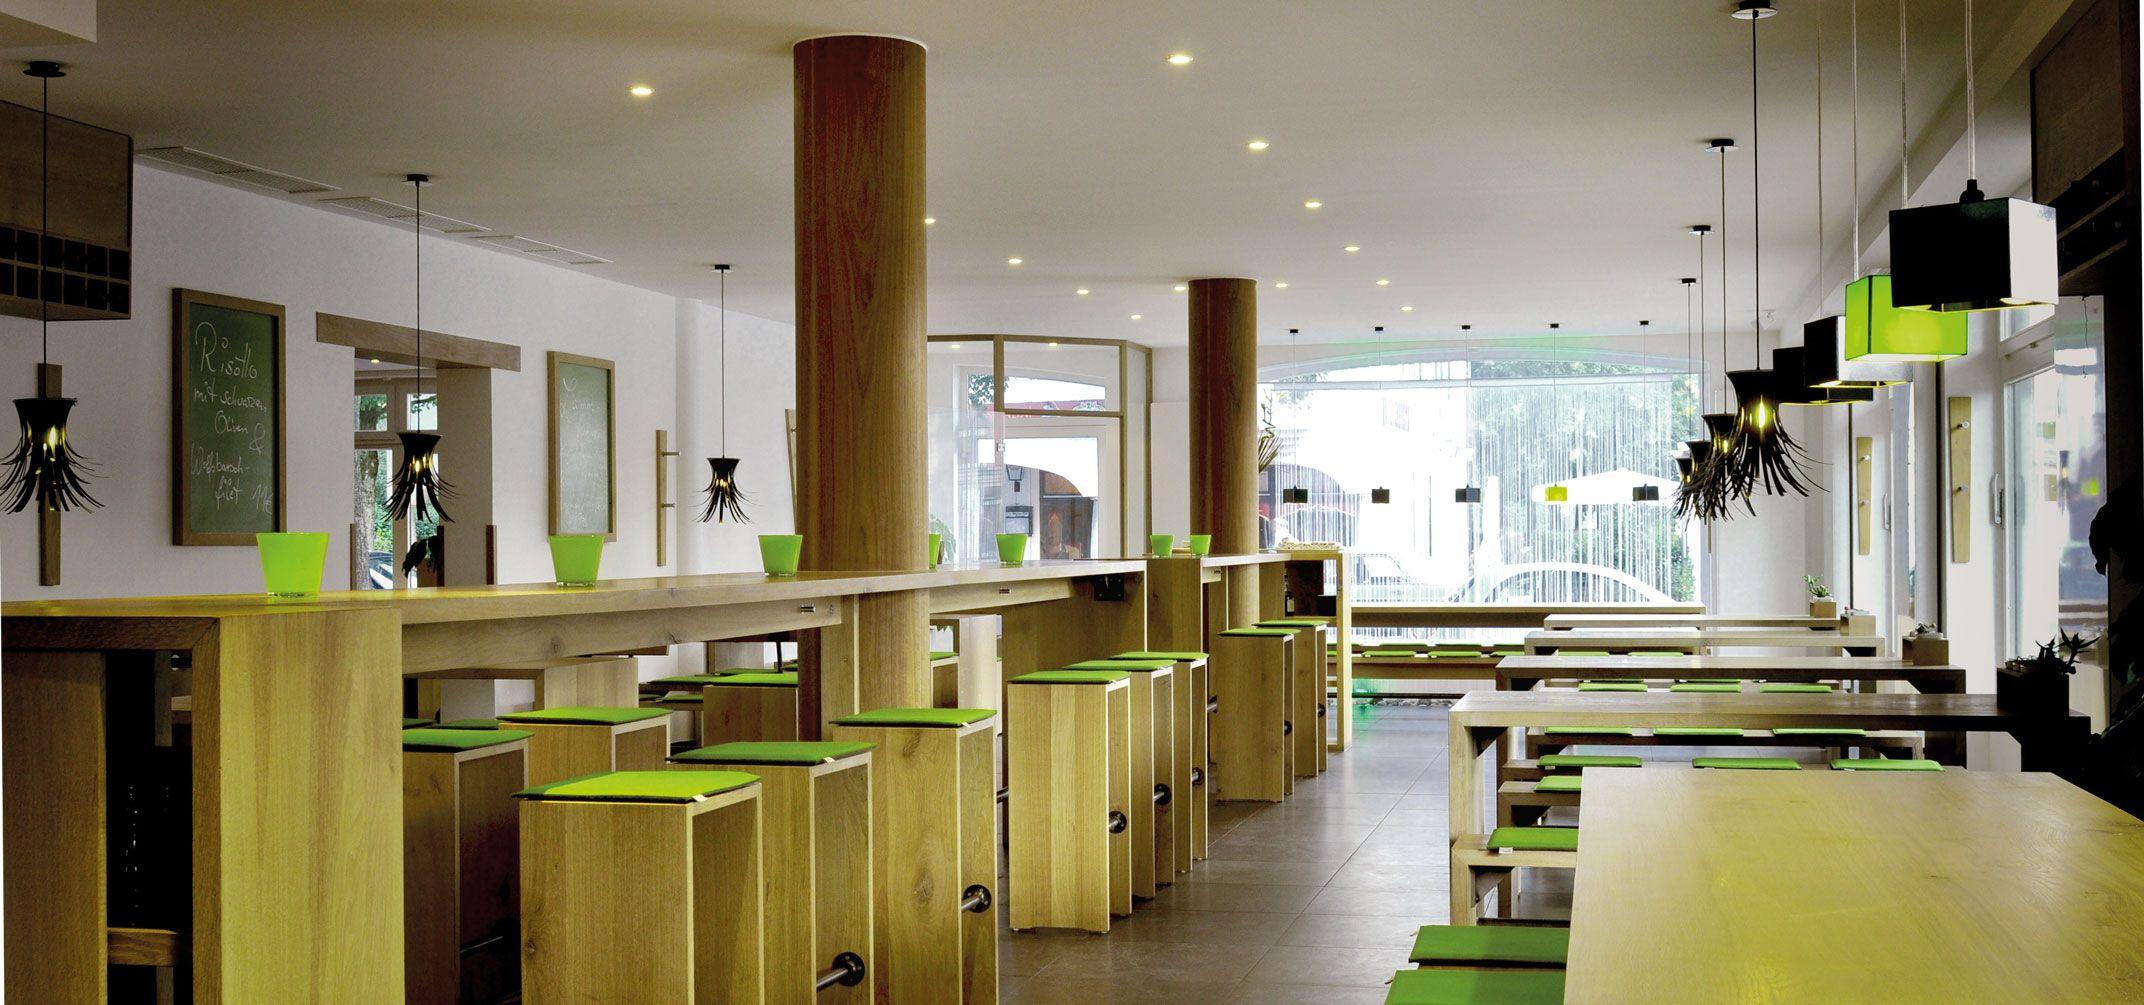 Verde - modern mediterranes Restaurant in Prien am Chiemsee | Verde - modern mediterran restaurant in Prien (Germany)